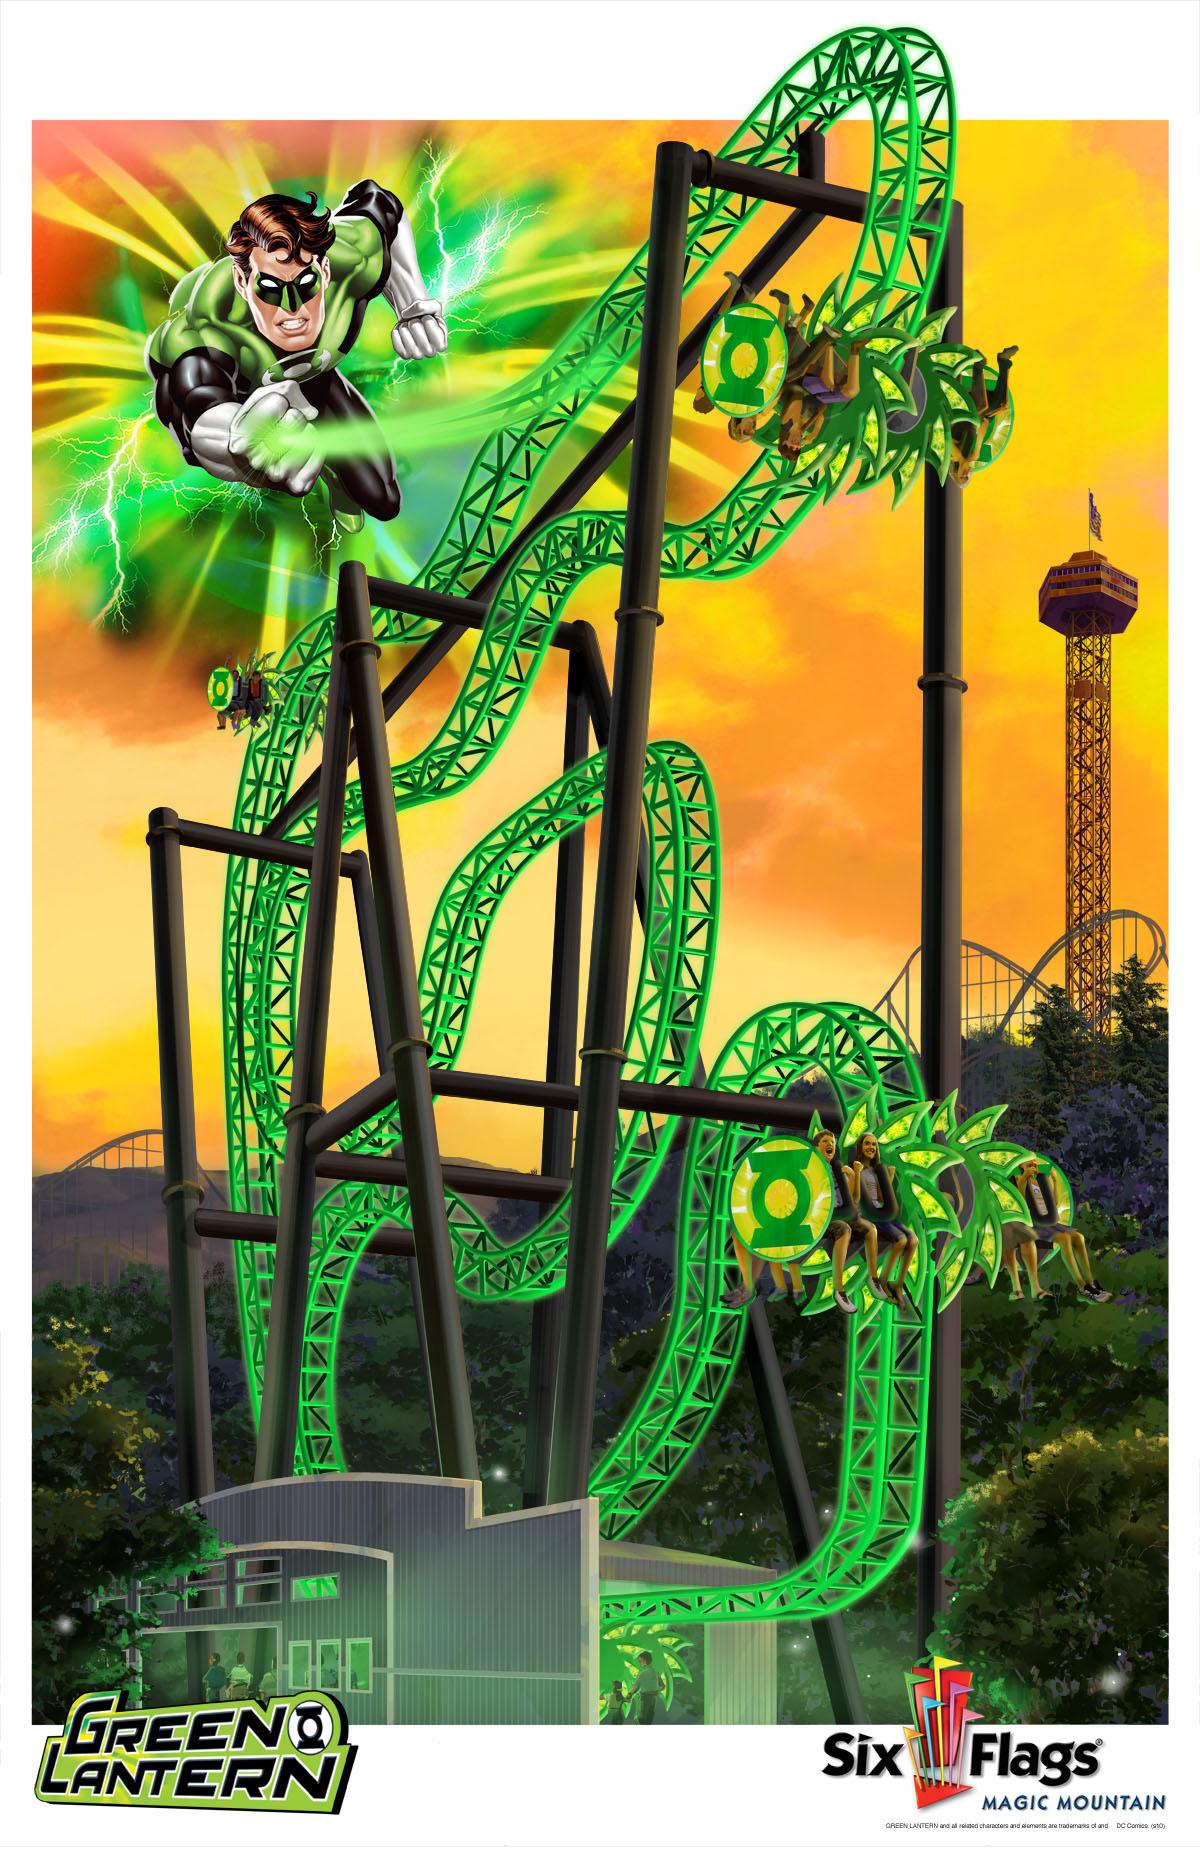 Green Lantern, Six Flags Magic Mountain Valencia, CA